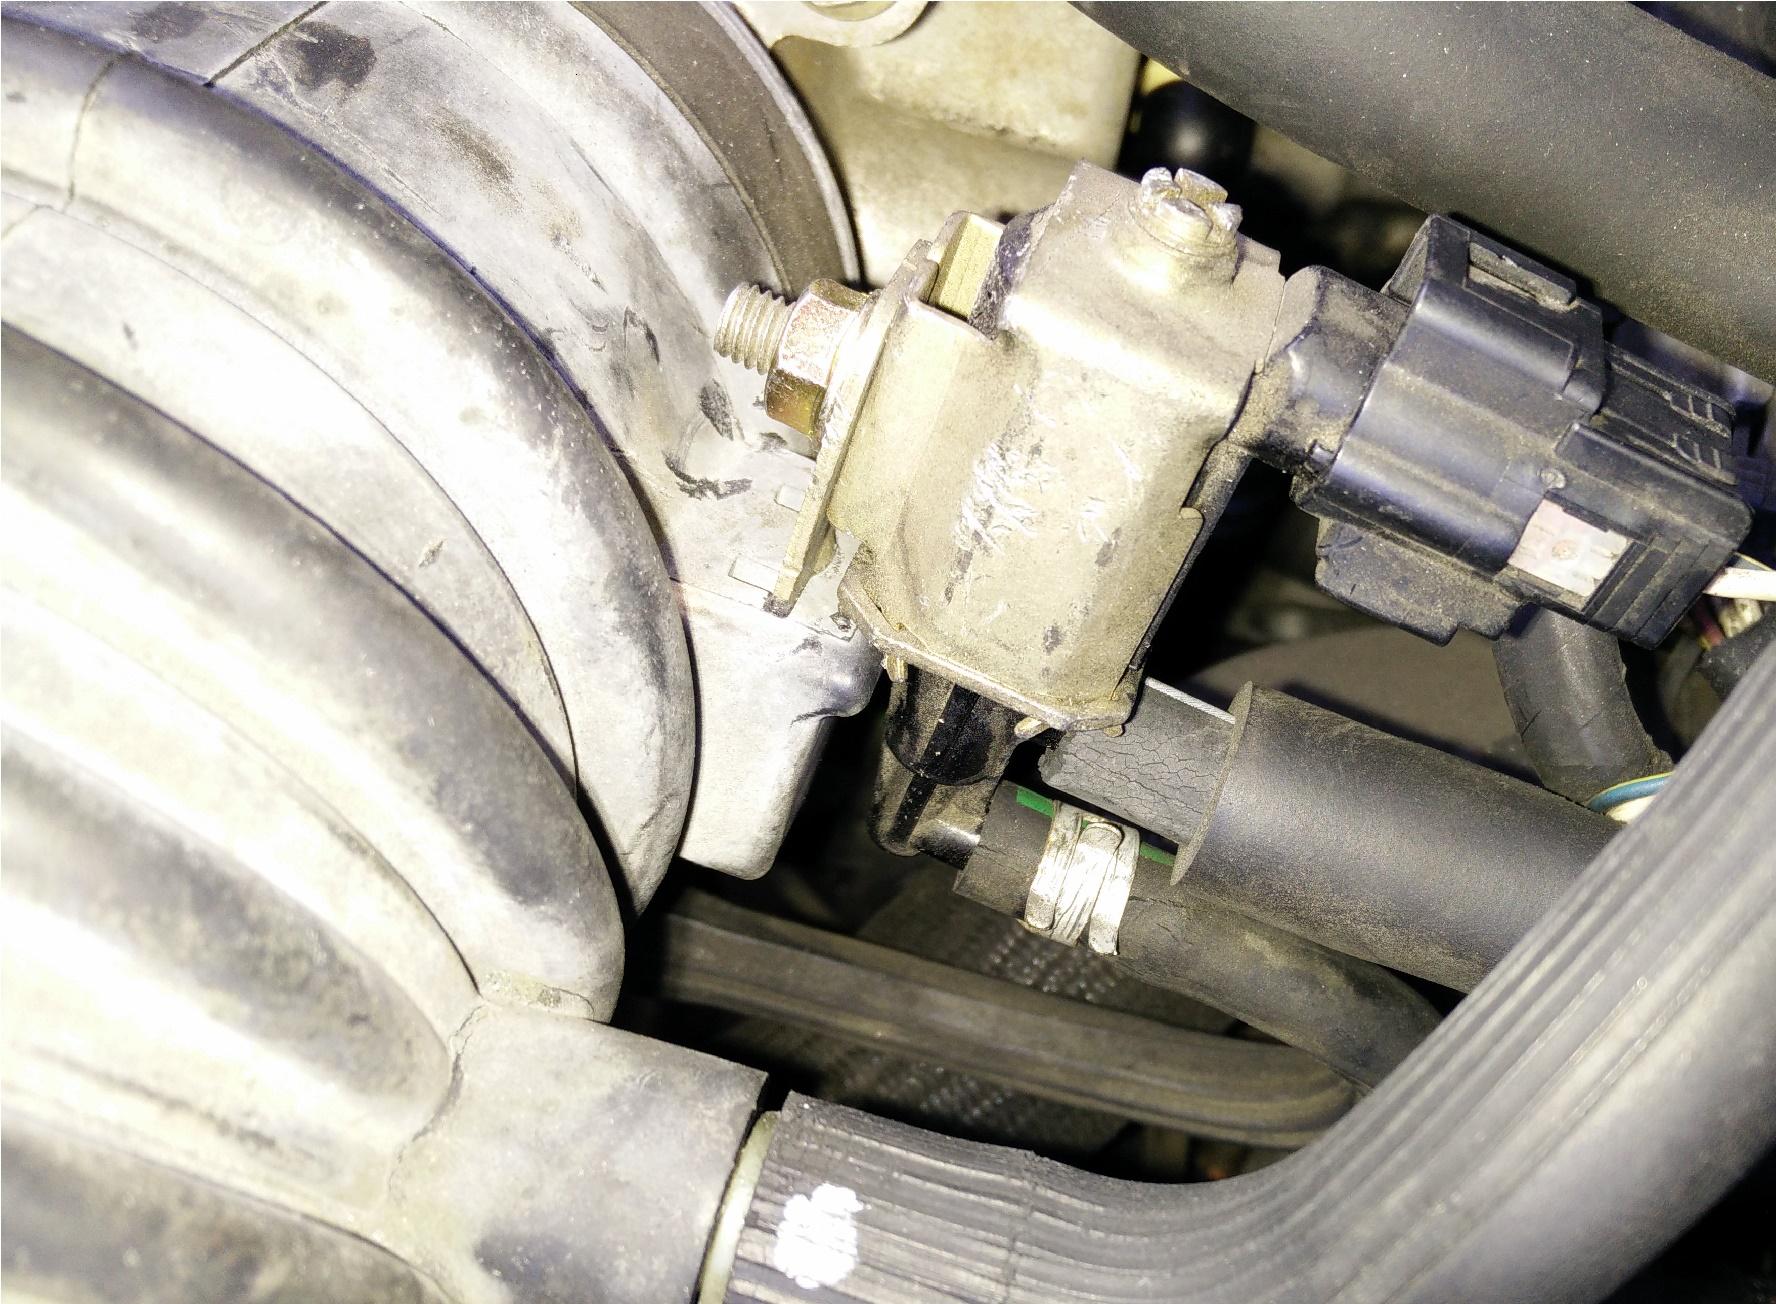 Mazda 6 Mazda 4 Likewise Mazda 626 Vacuum Diagram On Mazda 6 Vacuum